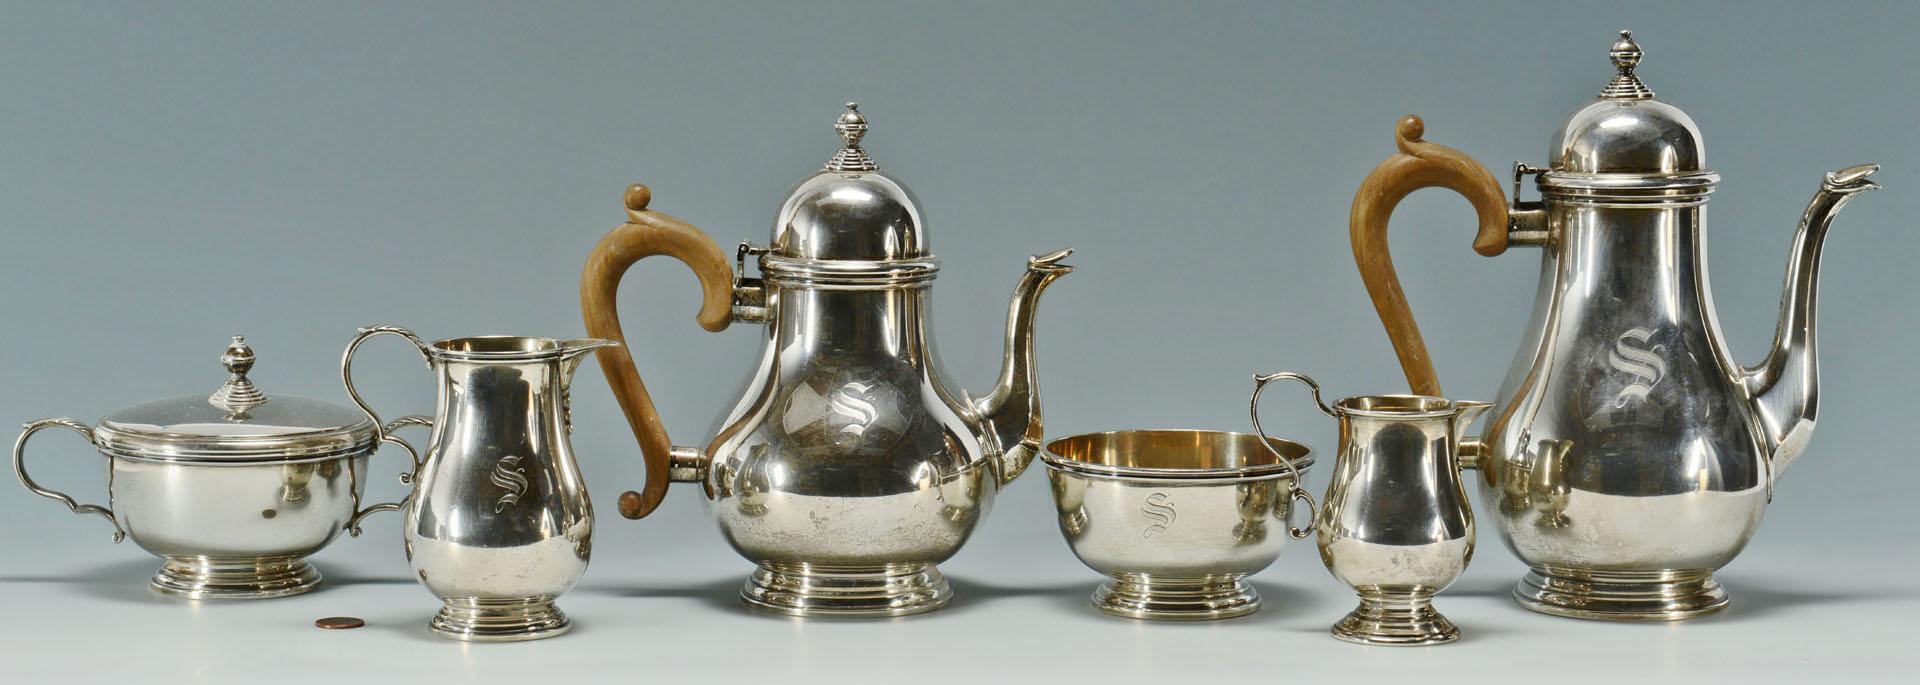 Gorham Sterling Silver Tea Service, 201 pattern